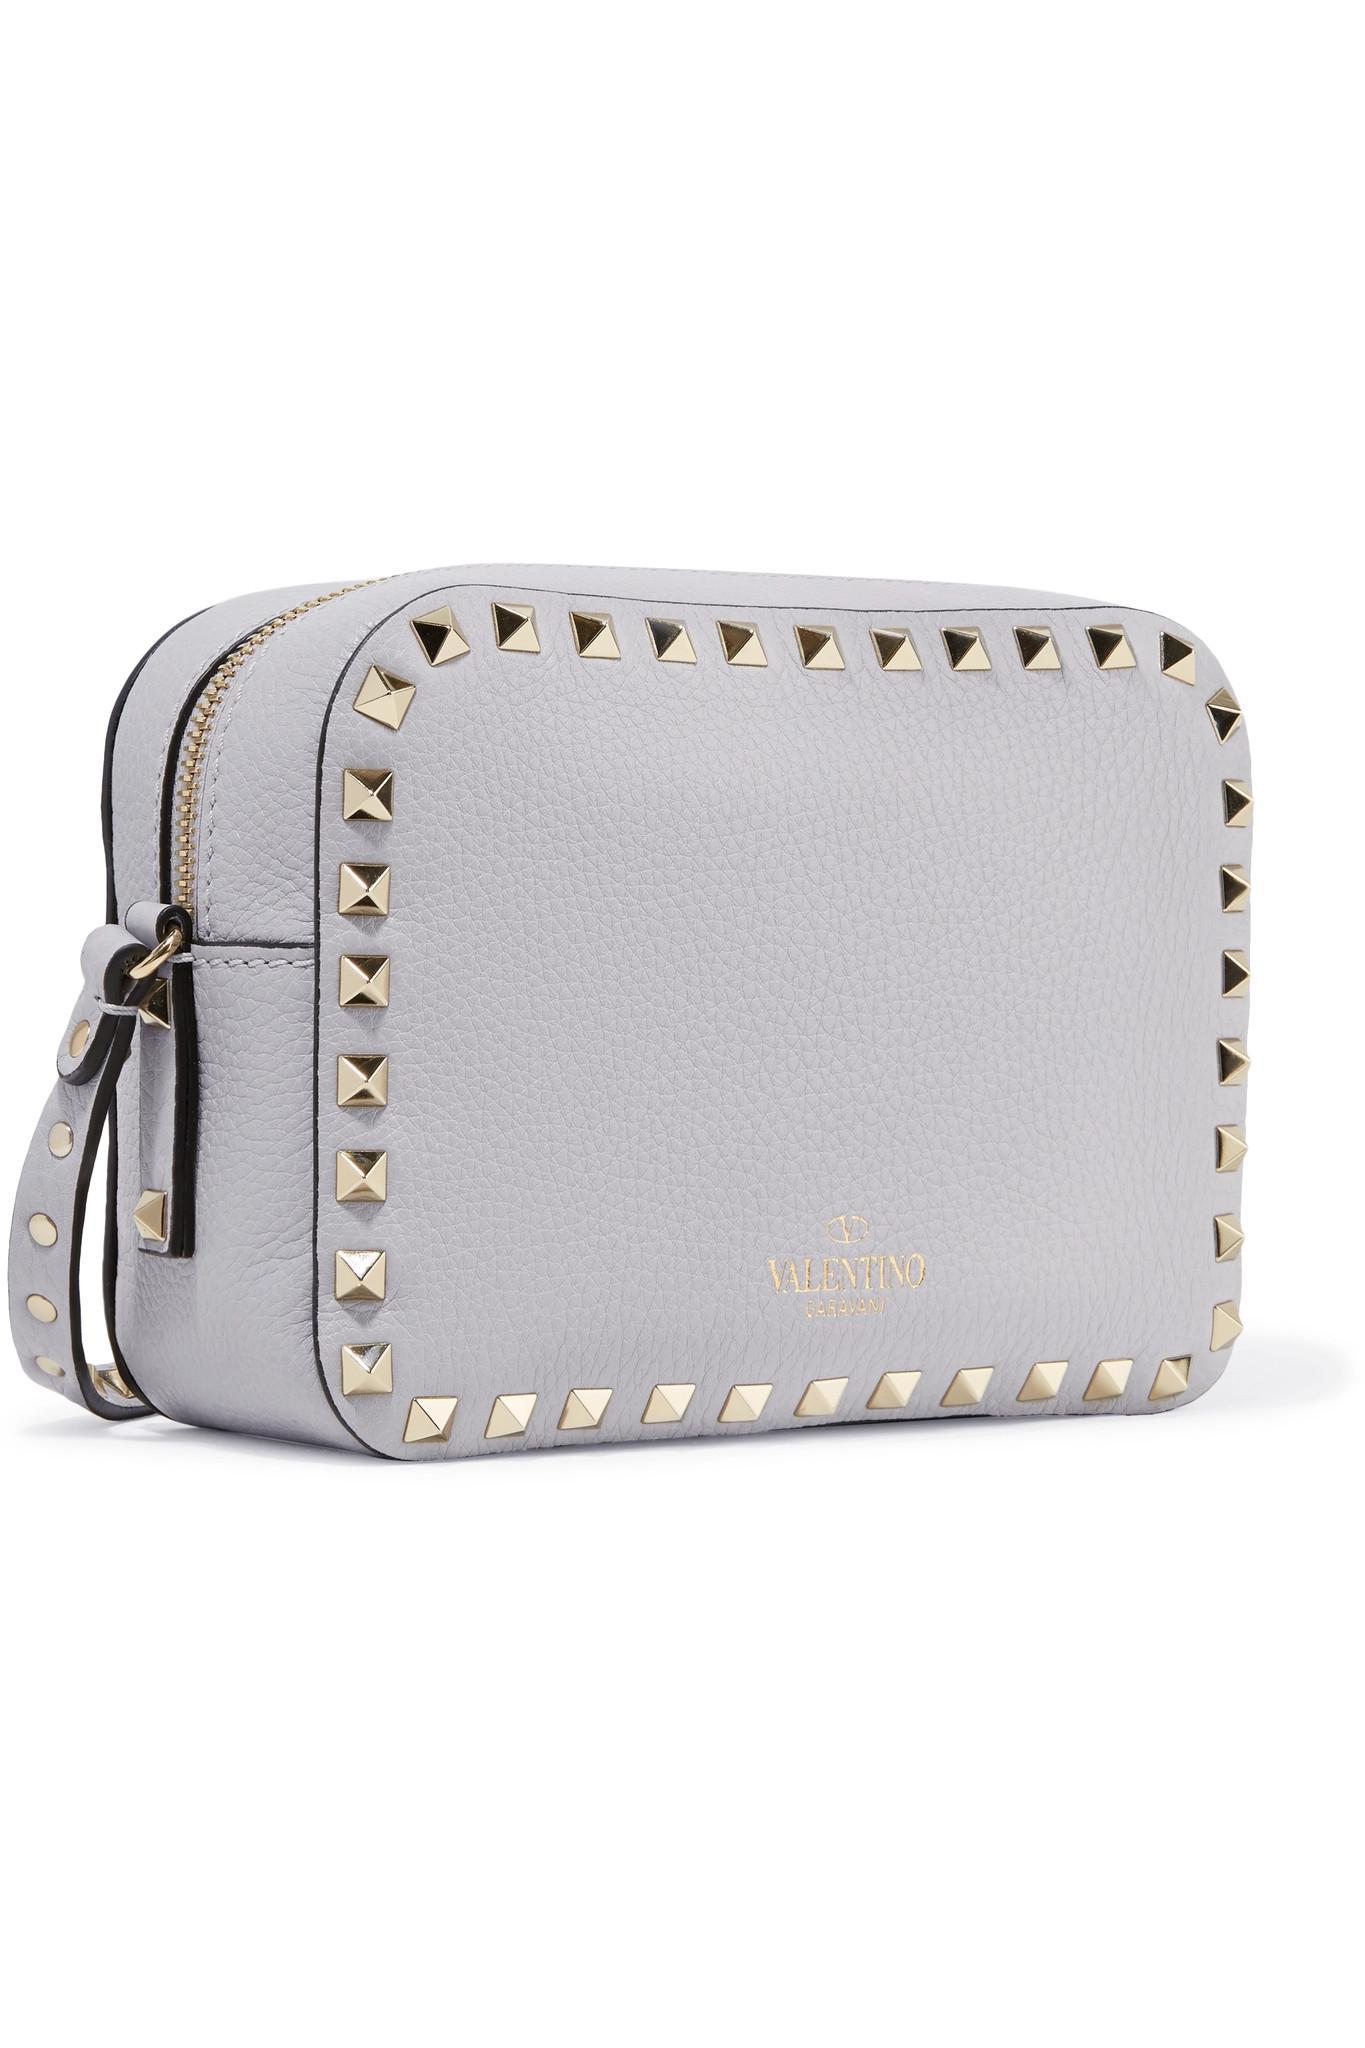 Valentino Garavani The Rockstud Textured-leather Shoulder Bag - Light gray Valentino Szskt6Y